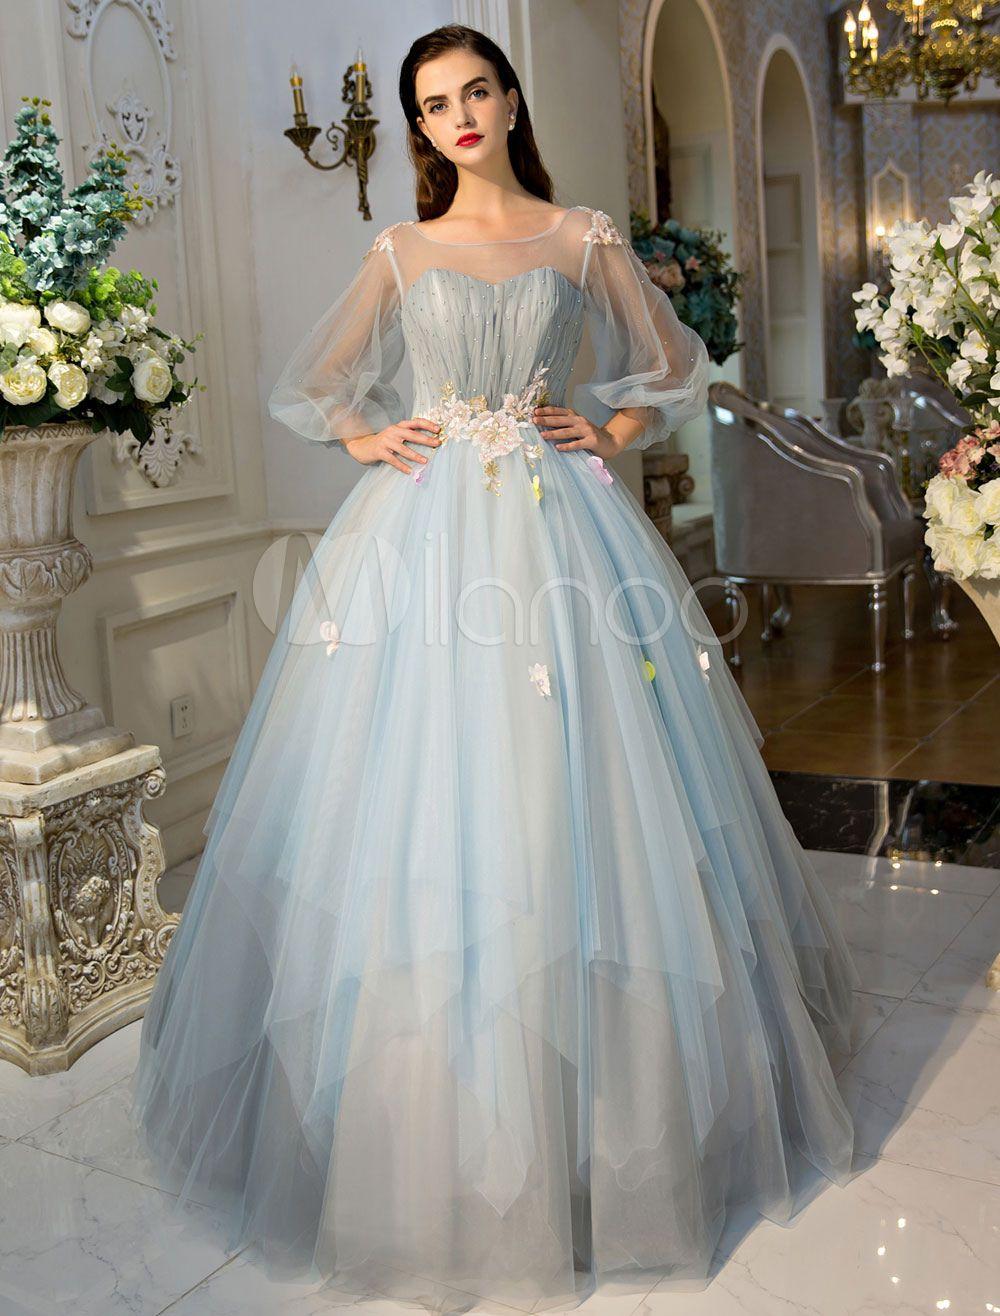 Princess prom dresses luxury long sleeve illusion tulle lace flowers